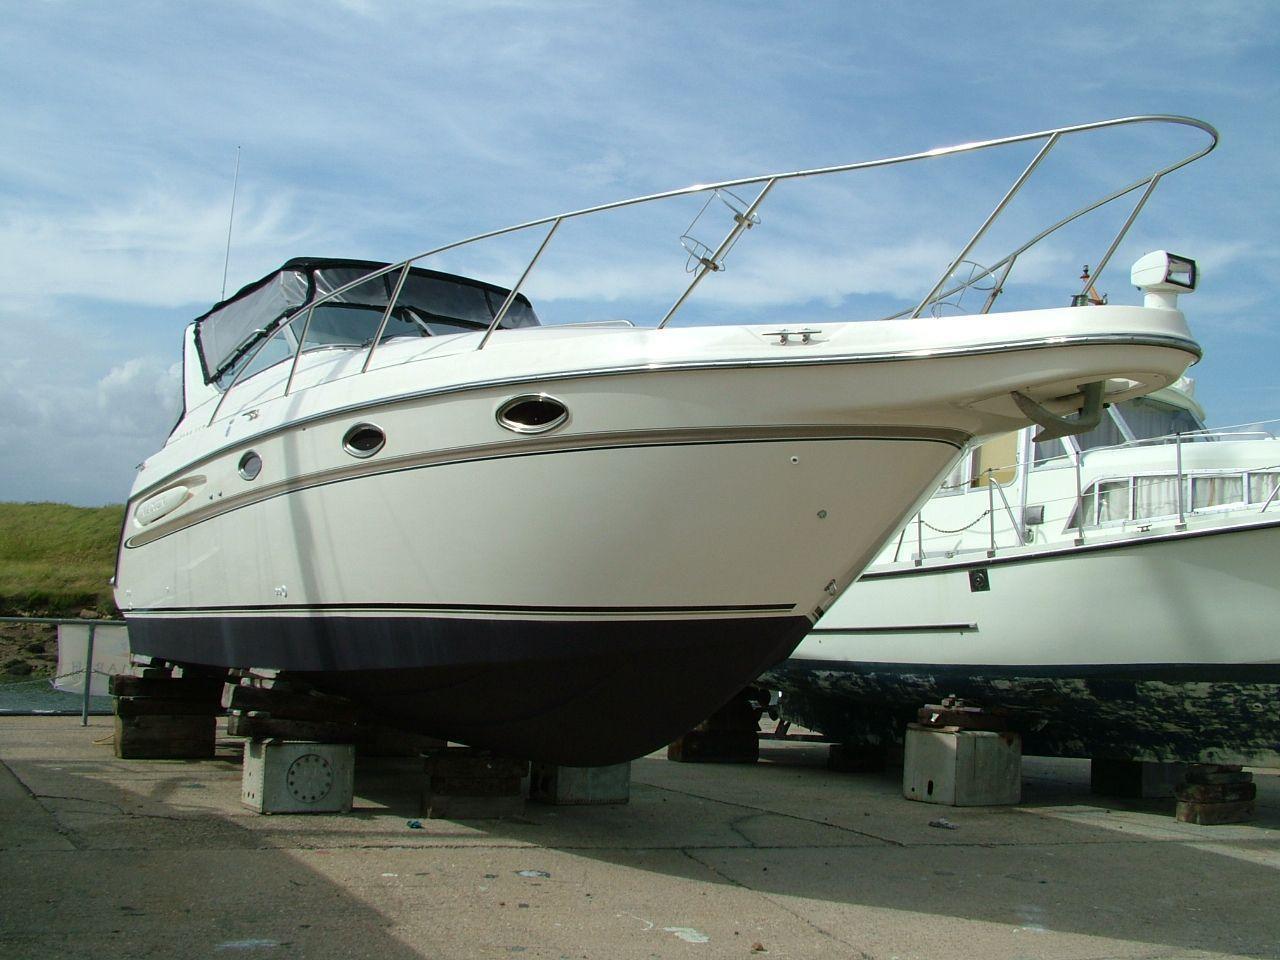 Maxum 3000 SCR, Titchmarsh Marina, Essex